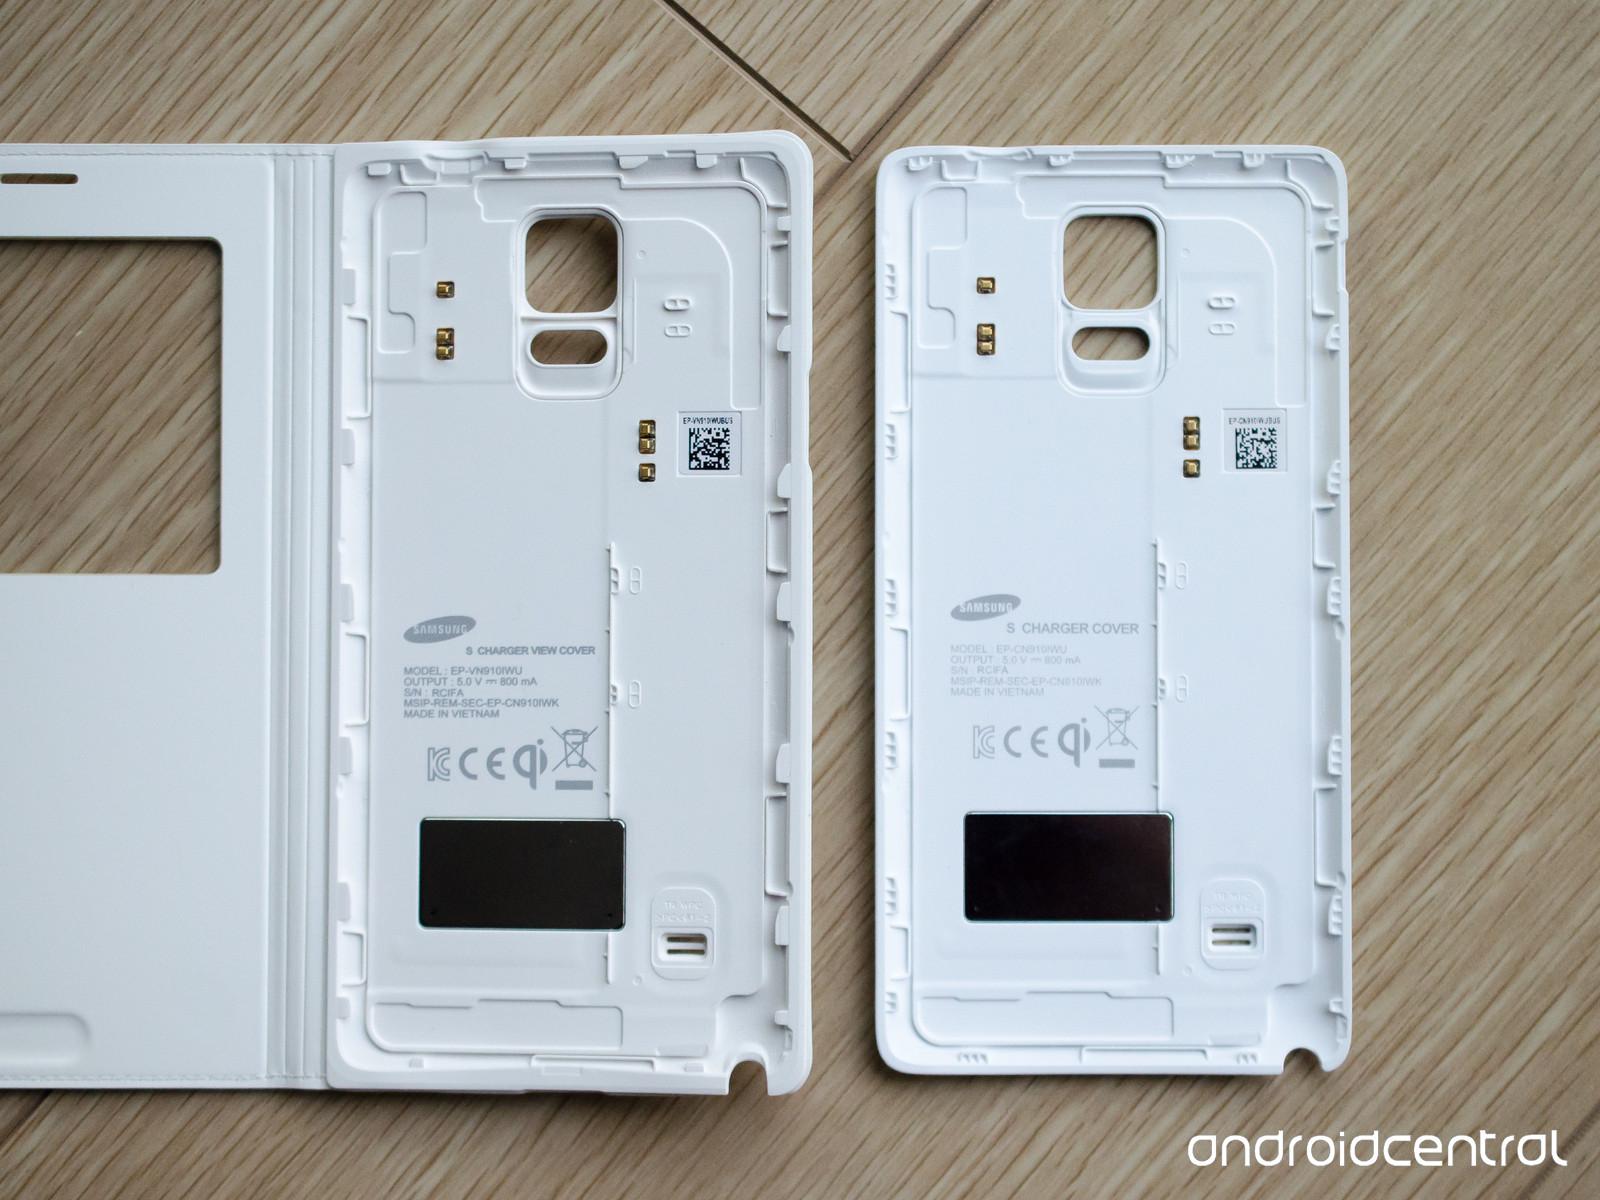 939436e7d94 El Note 4 recibe carga inalámbrica gracias a las carcasas Qi oficiales